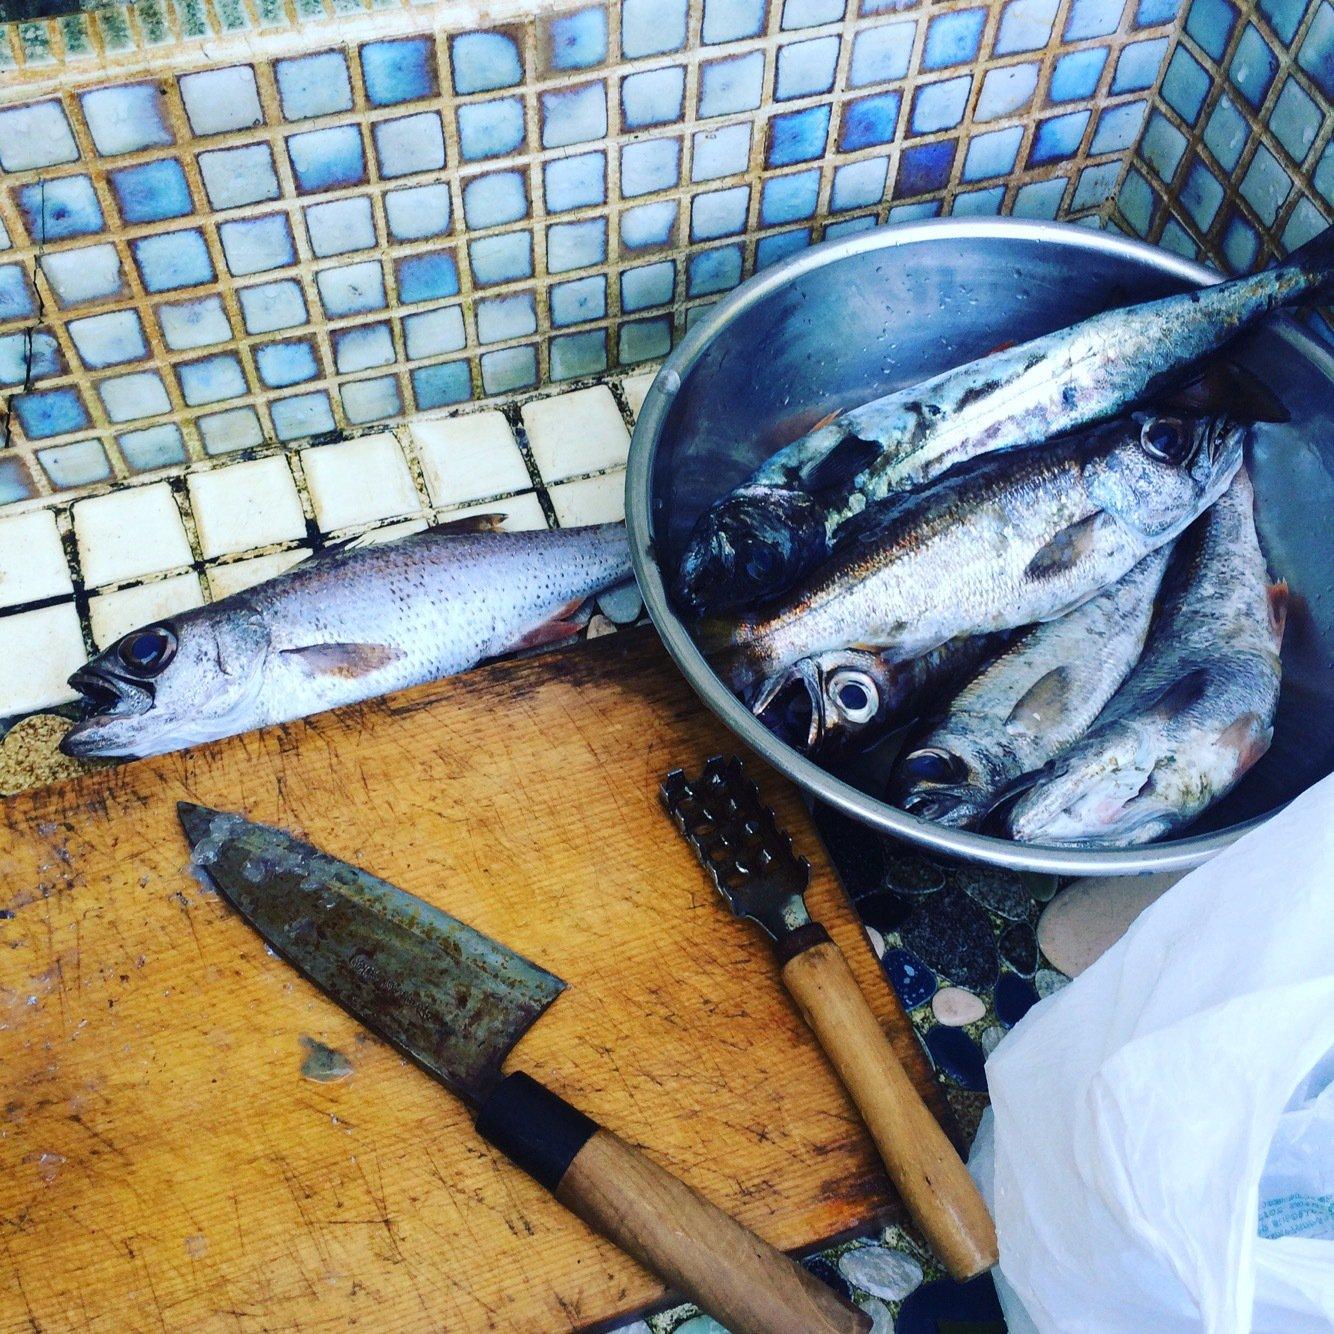 Esakuさんの投稿画像,写っている魚はクロムツ